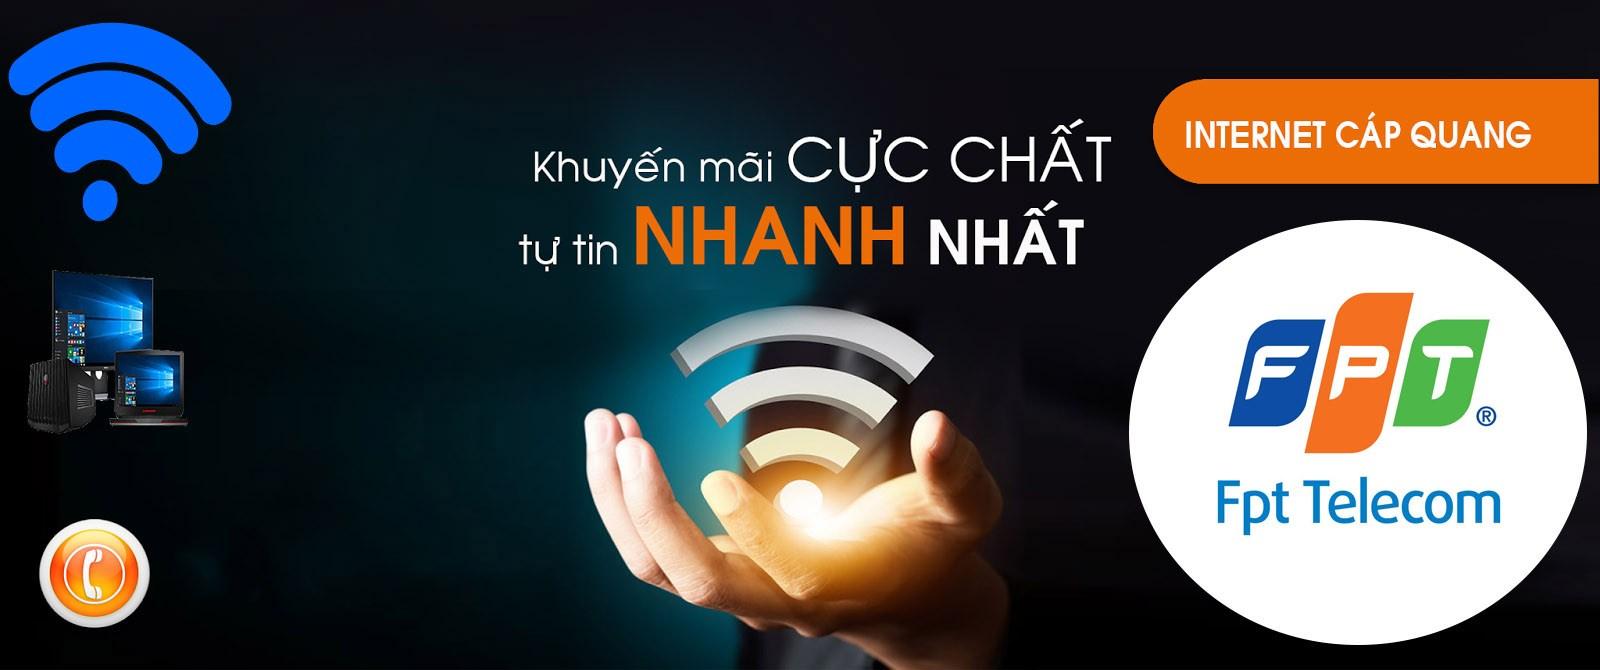 fpt-hn.net-cap-quang-fpt-phu-xuyen